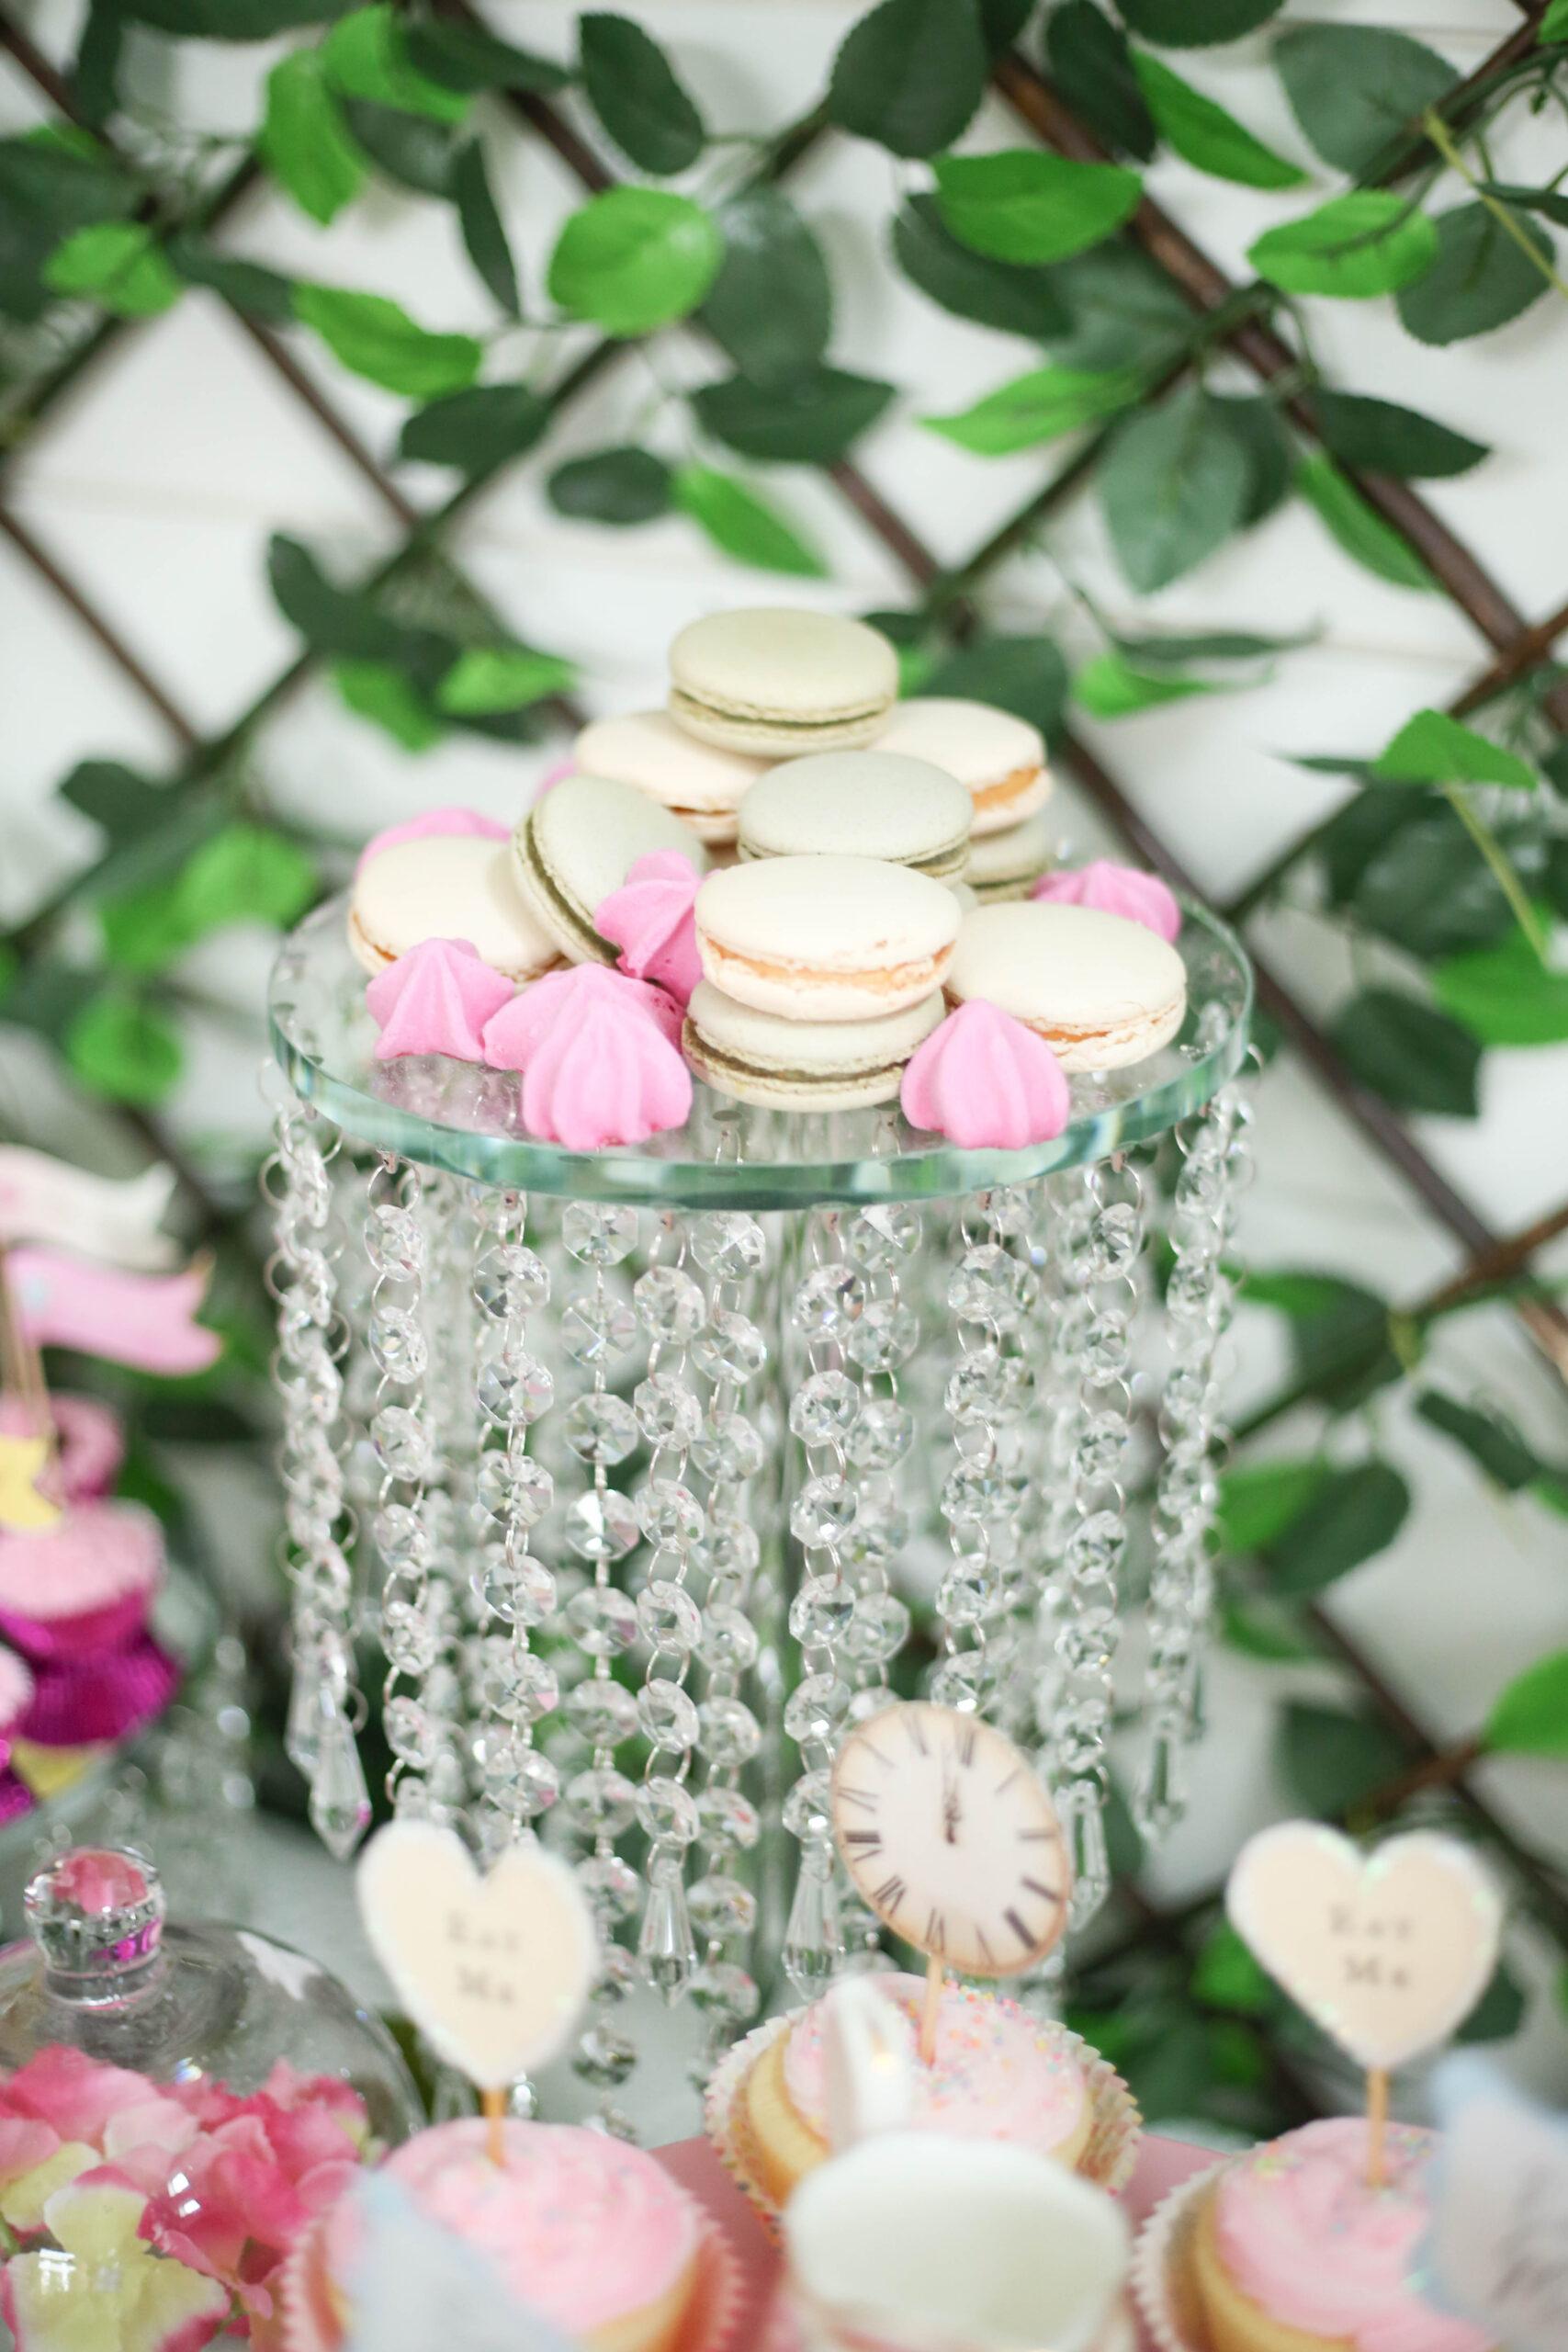 crystal cake stand with macarons